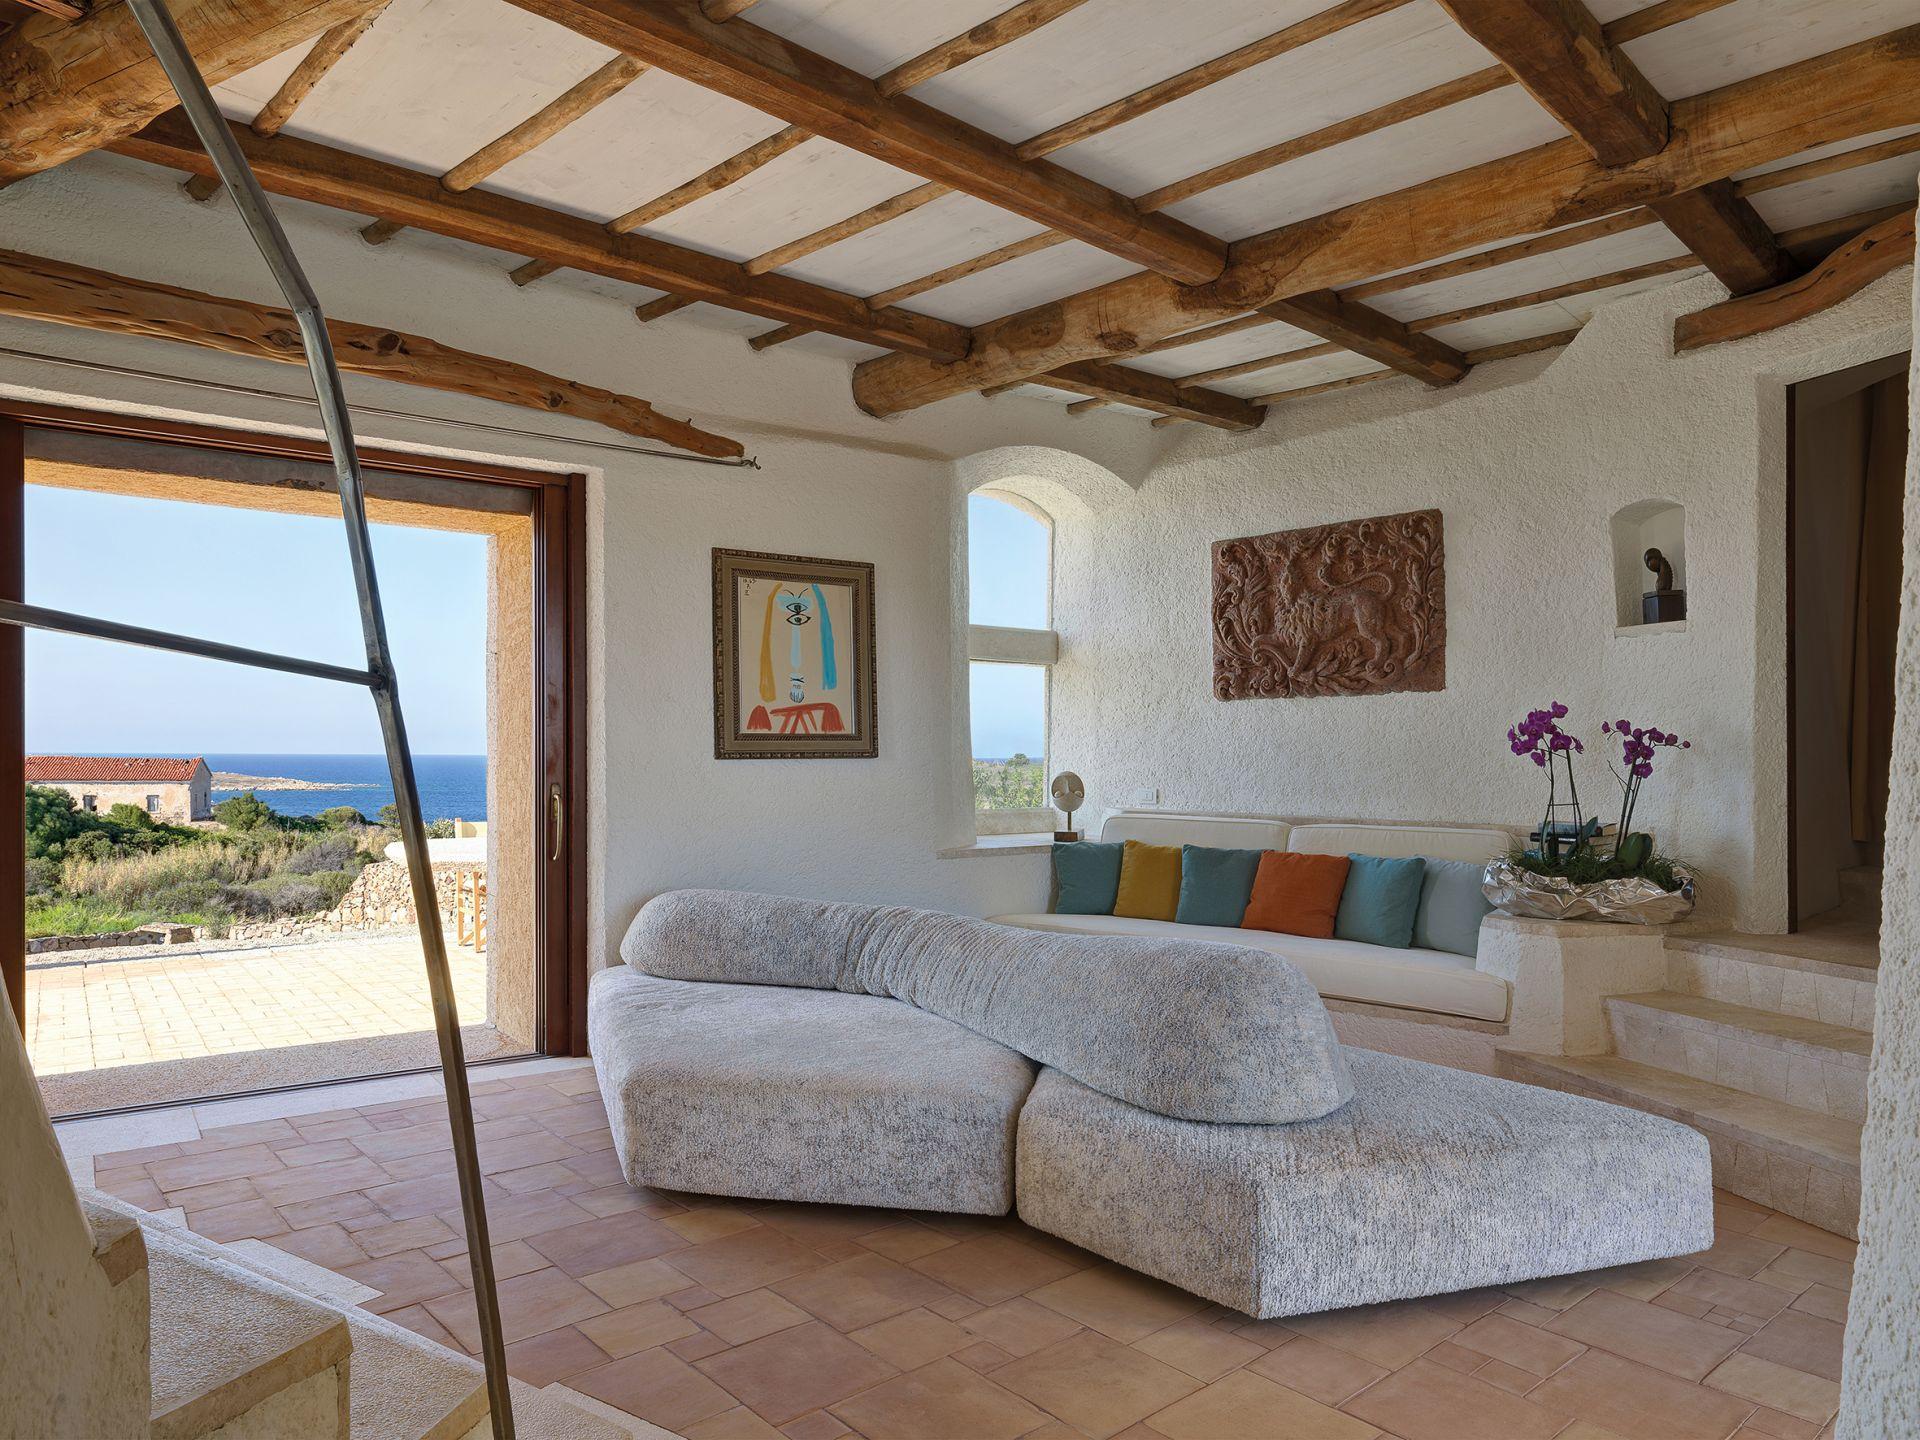 Villa in Sardegna - image 1